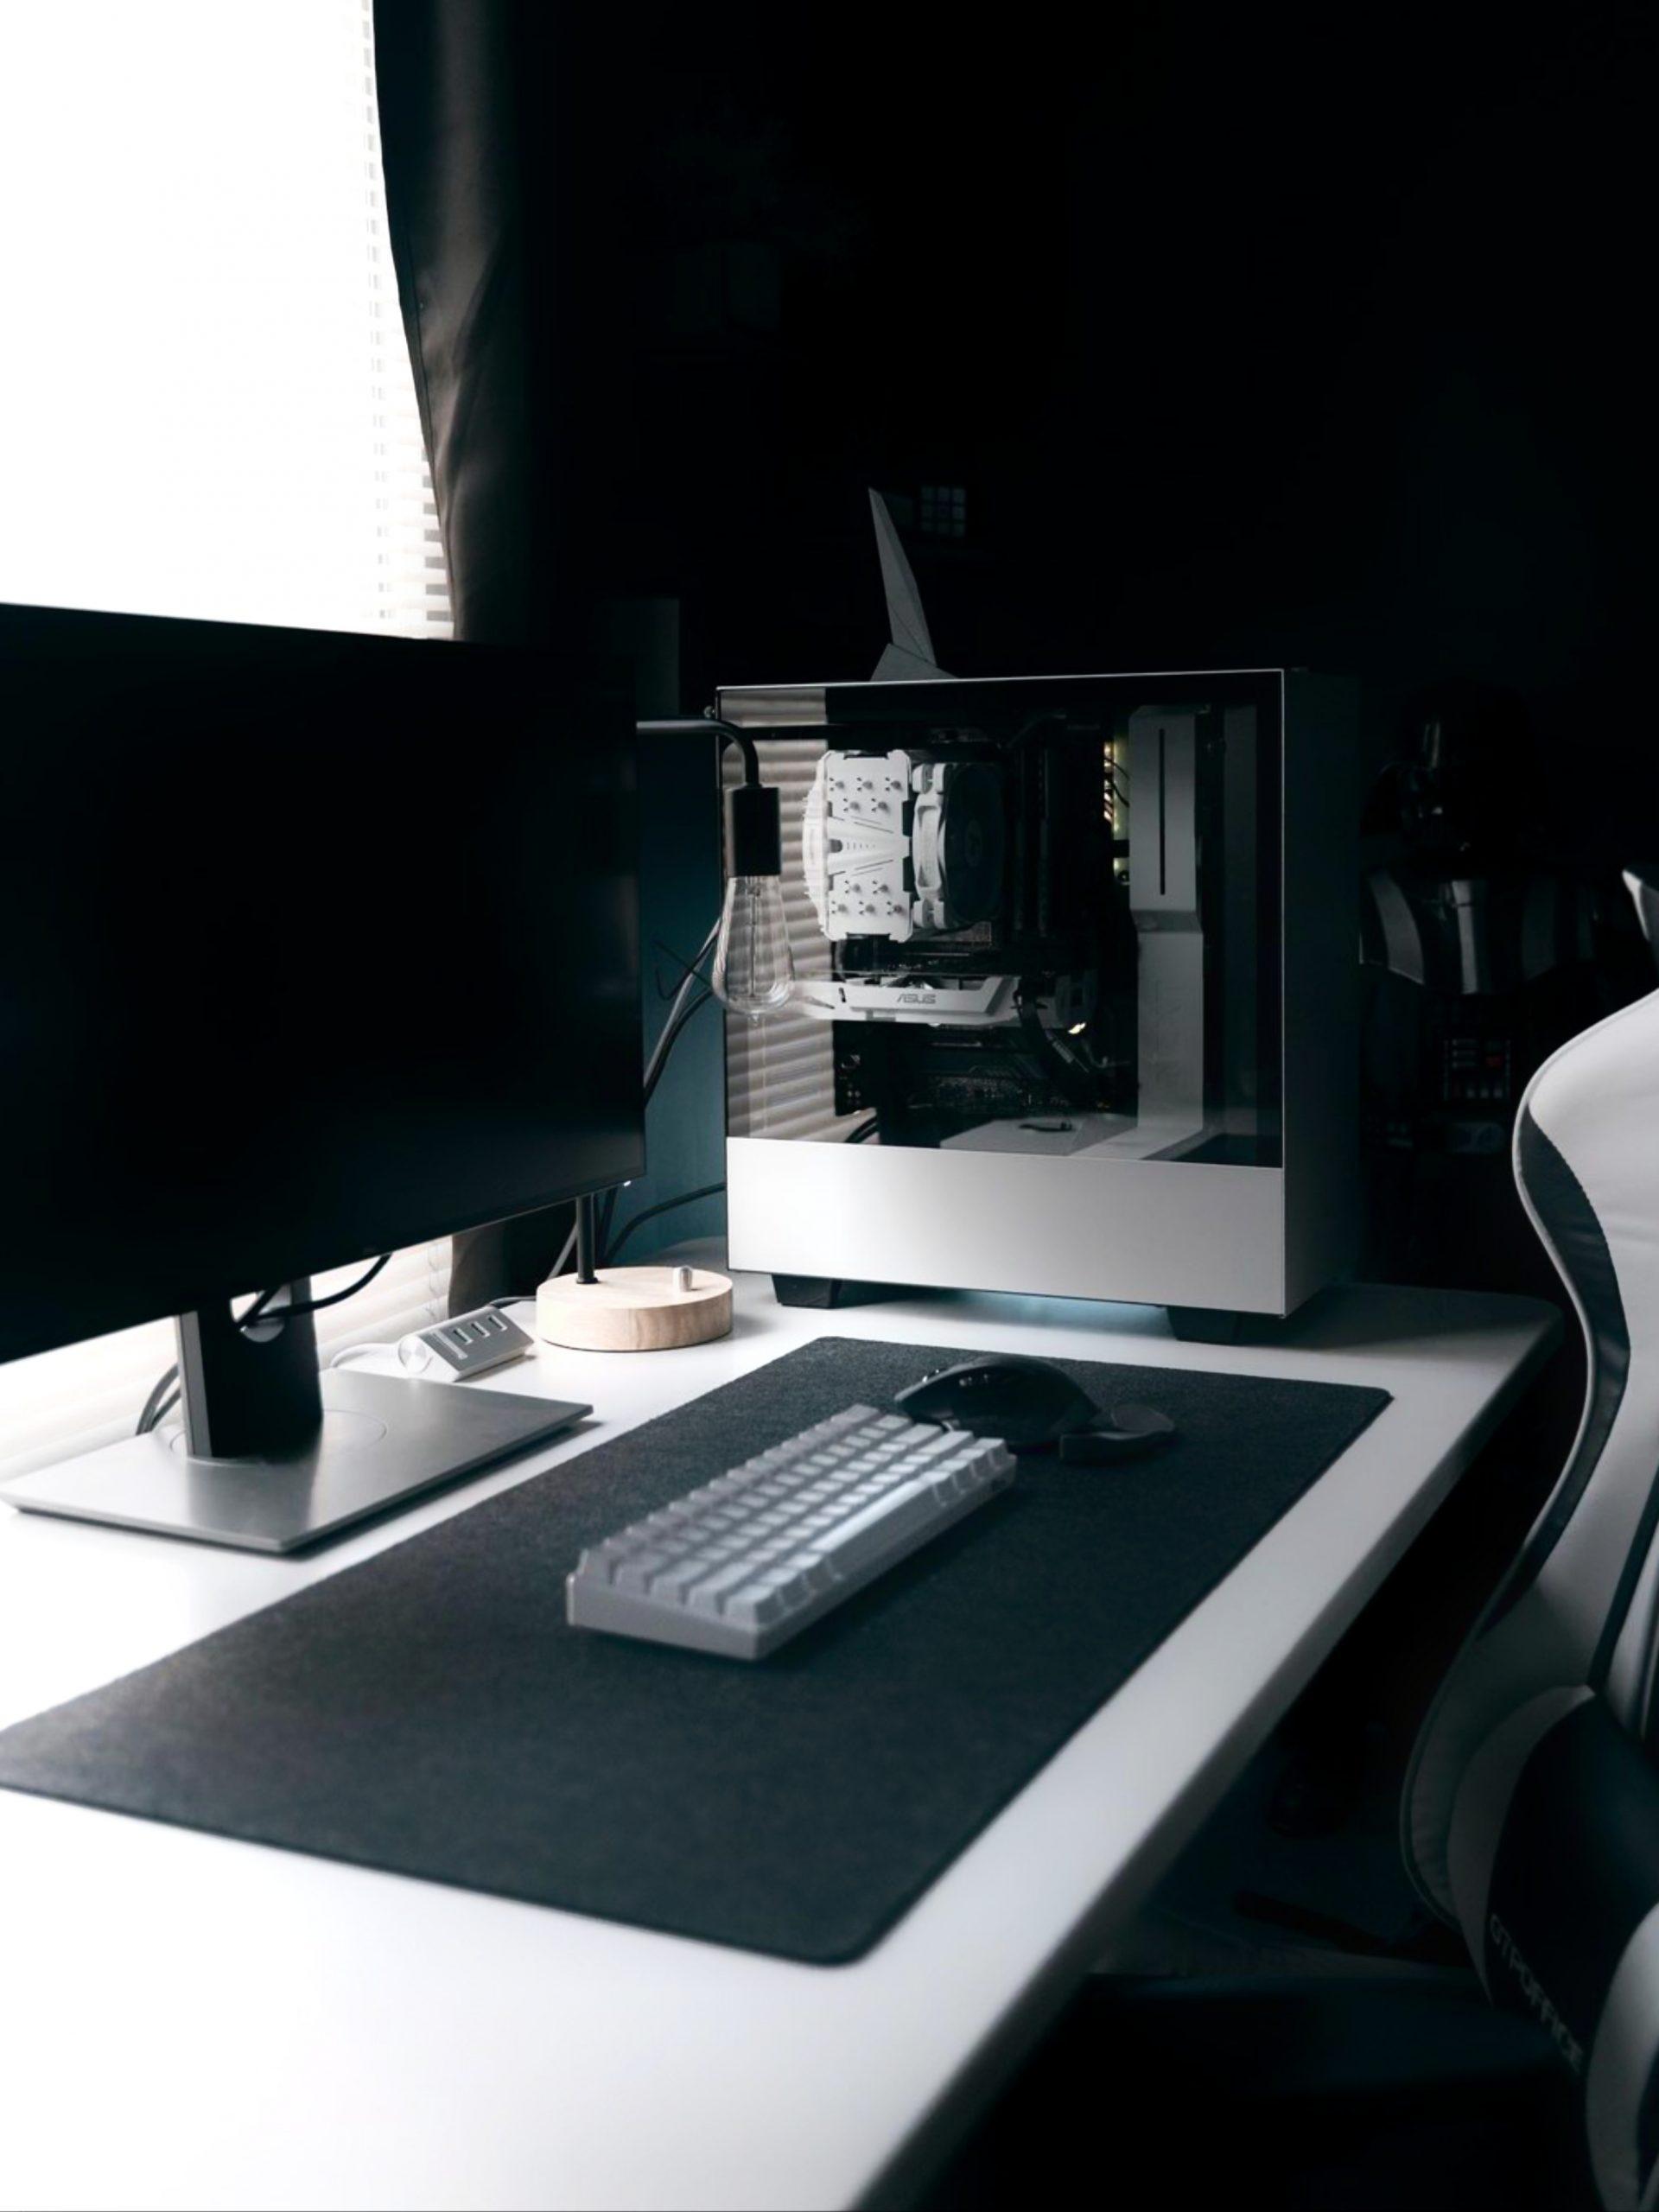 A desktop system